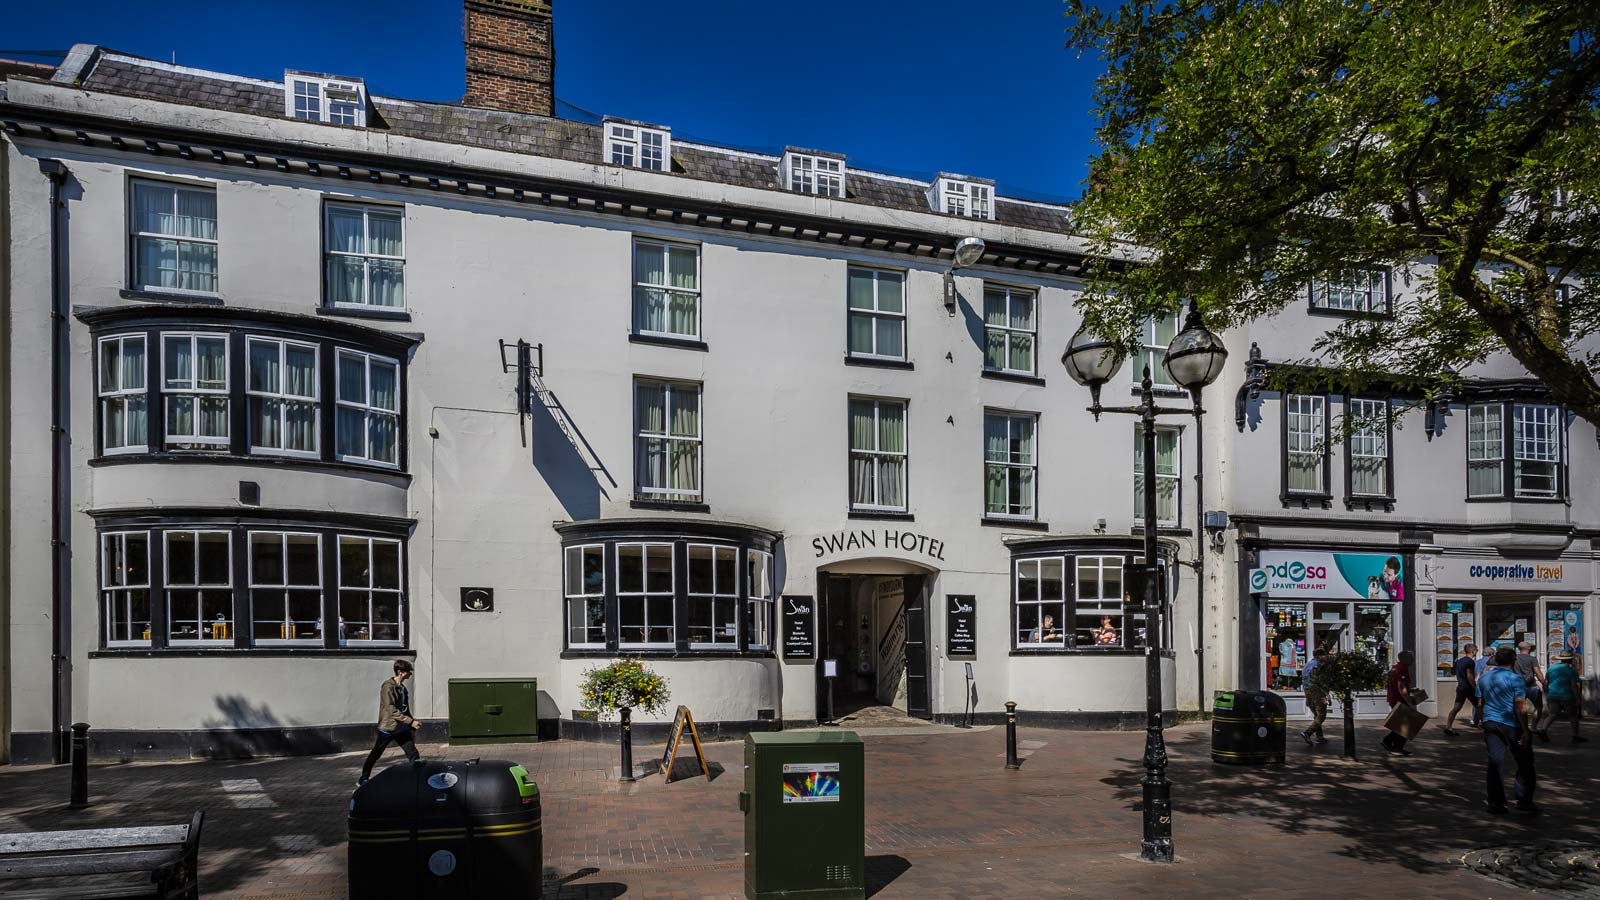 The-Swan-Hotel-Brasserie-Coffee-Shop-Stafford-Staffordshire-Coaching-Inn-Group